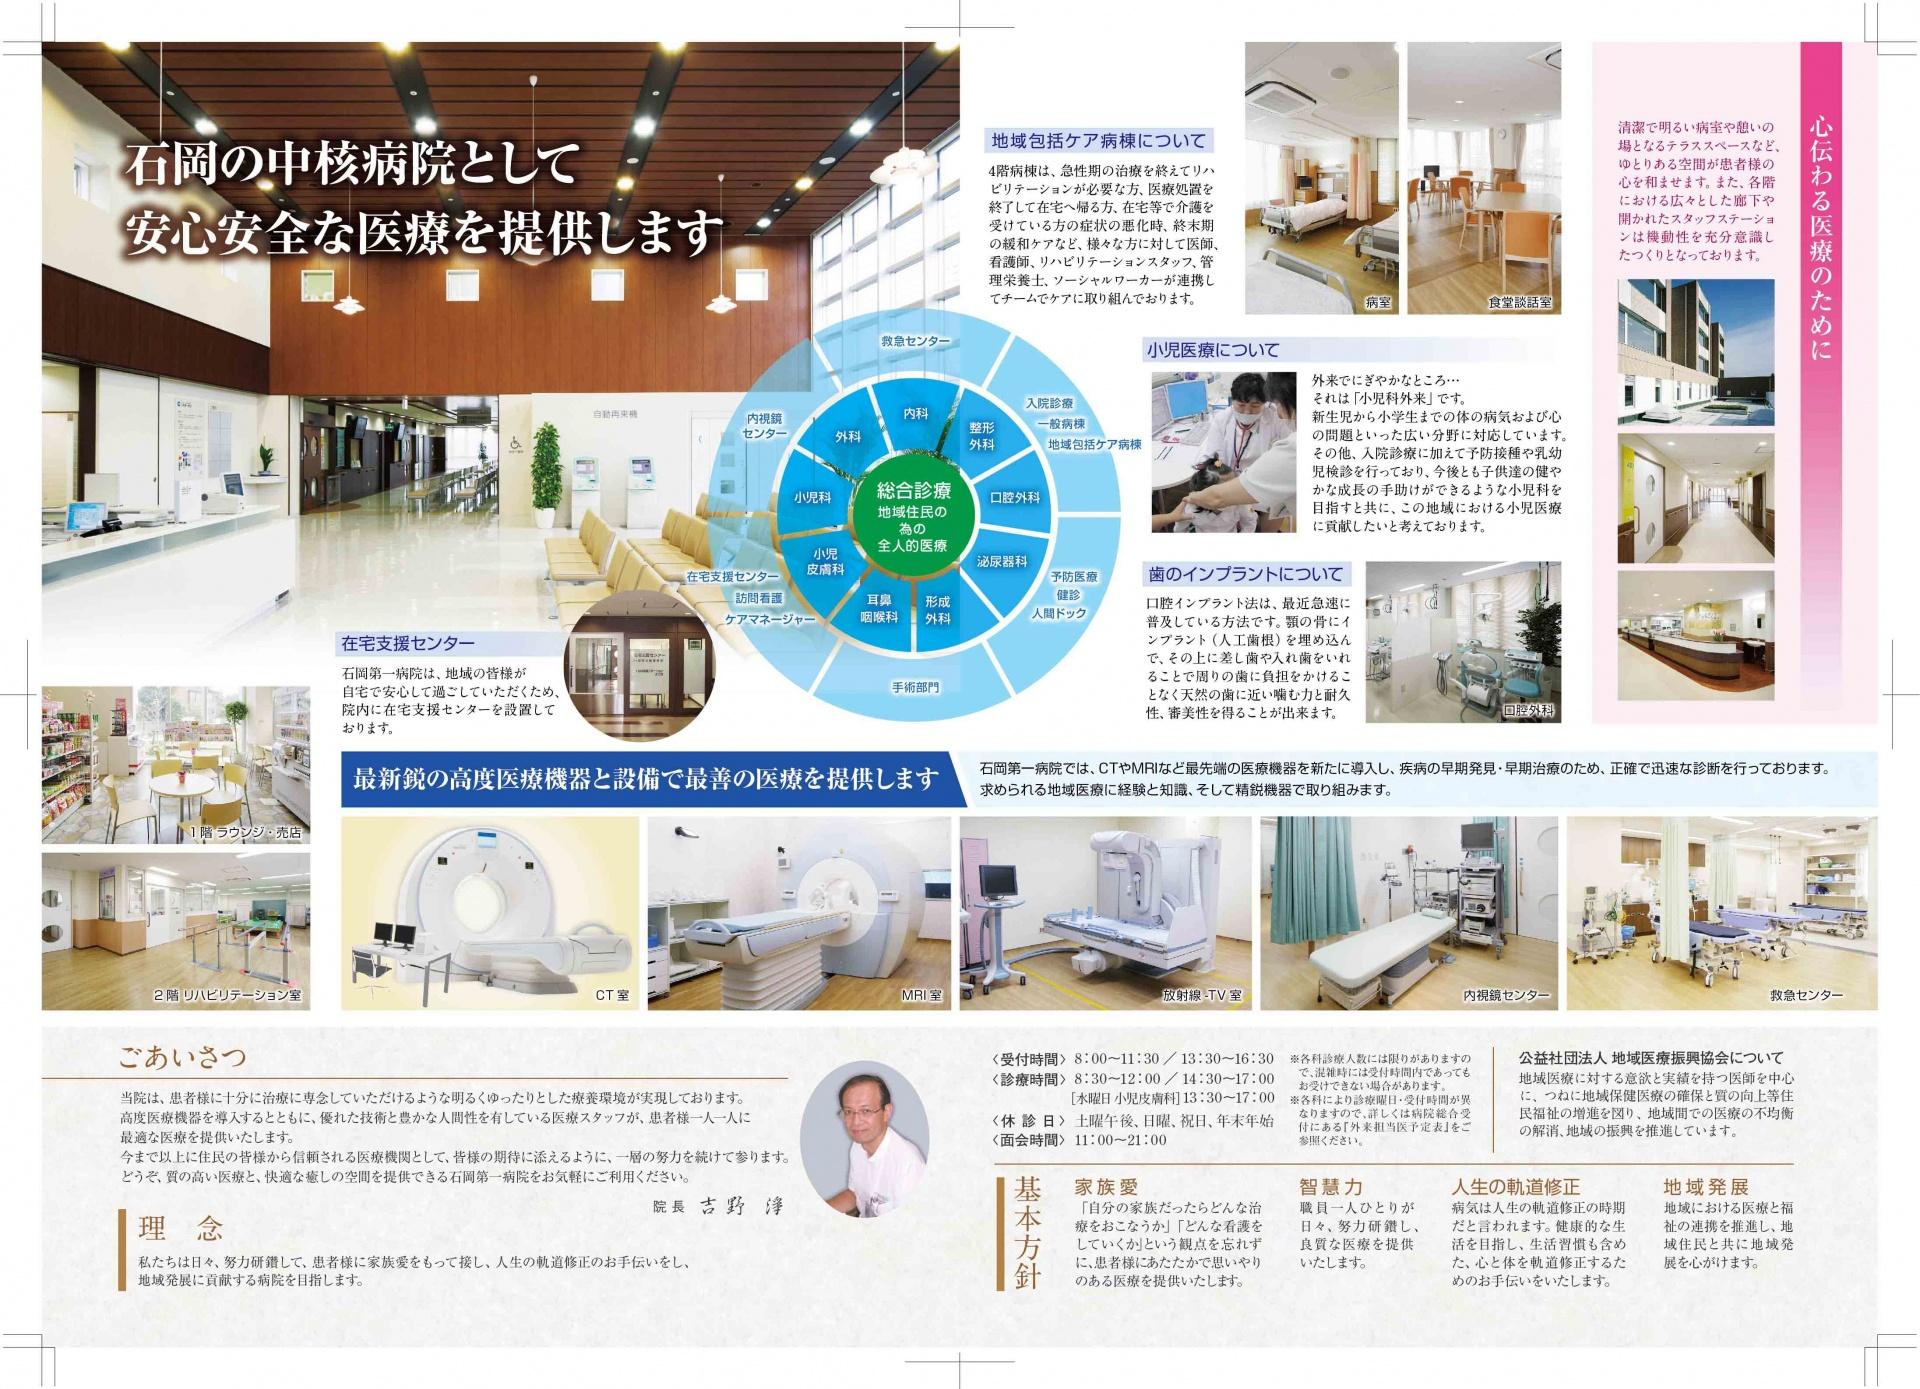 ishiokadaiichi_panfu_naka